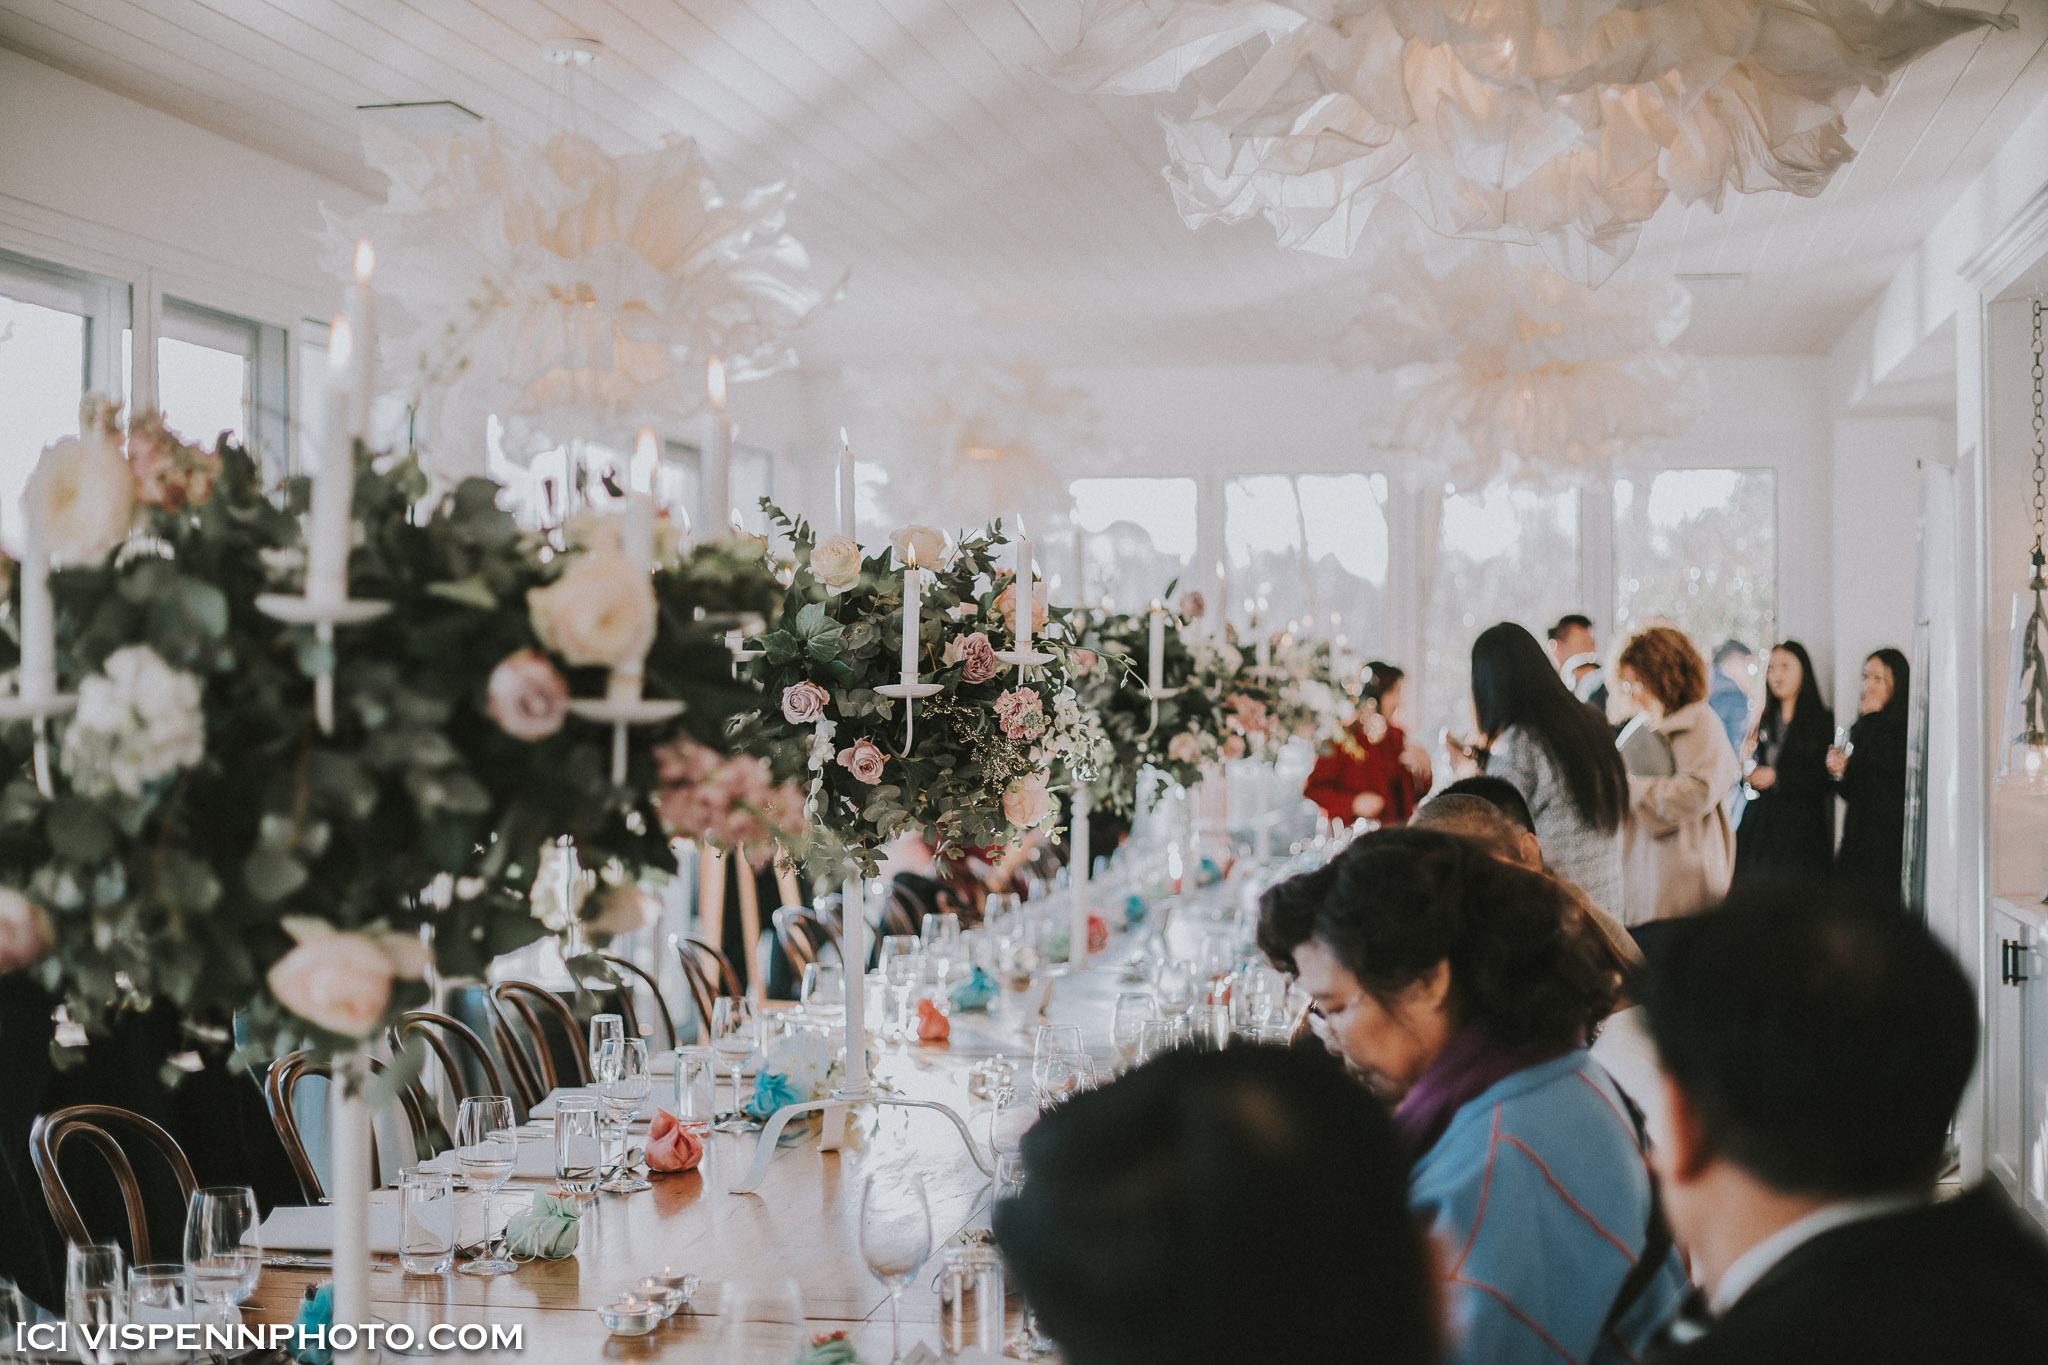 WEDDING DAY Photography Melbourne VISPENN 墨尔本 婚礼跟拍 婚礼摄像 婚礼摄影 结婚照 登记照 VISPENN 5D4 1198